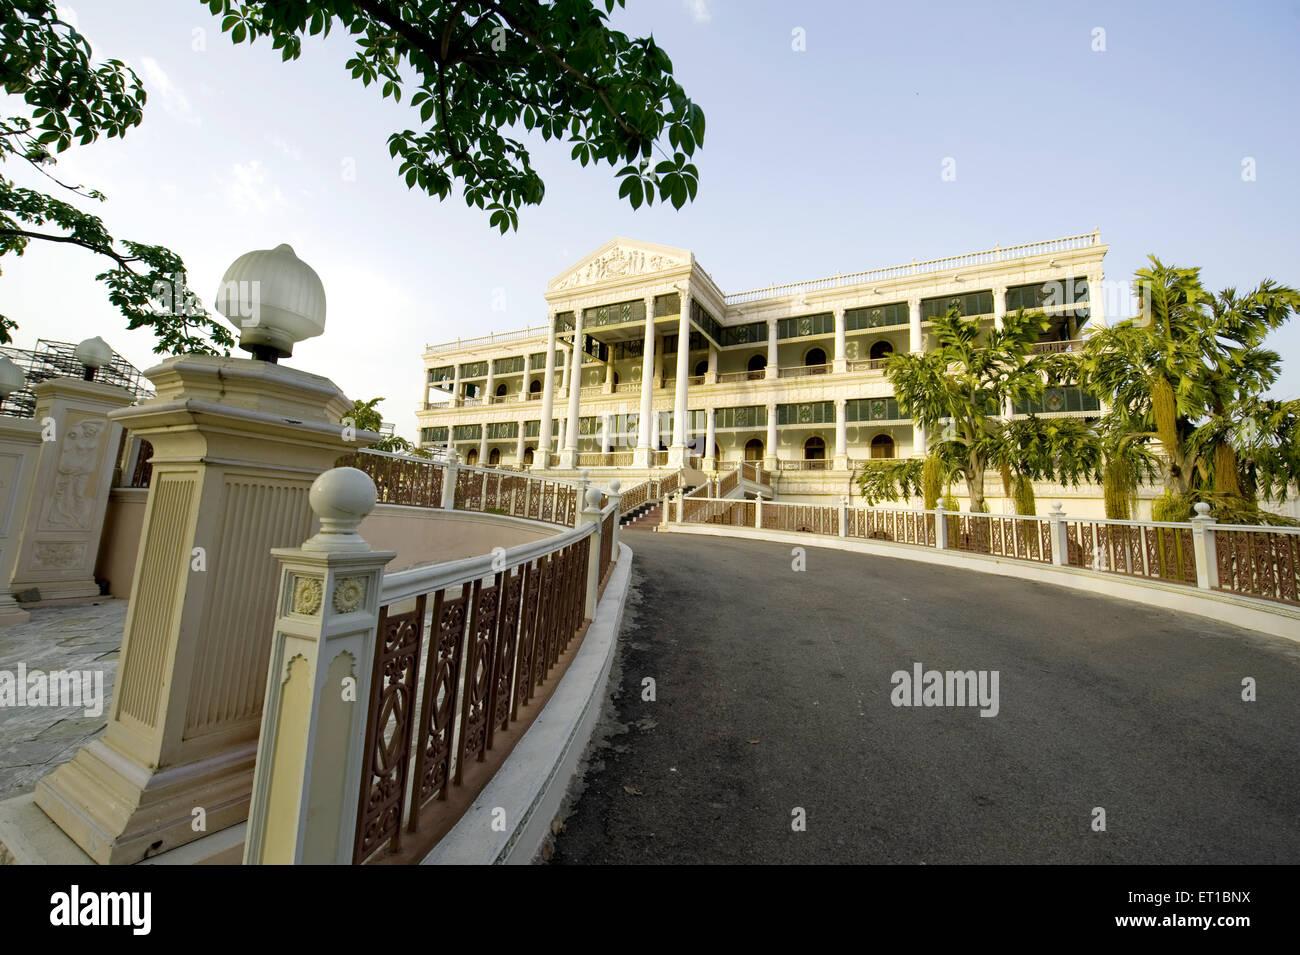 Bungalow Situati a ramoji film city ; Hyderabad ; Andhra Pradesh ; India Immagini Stock